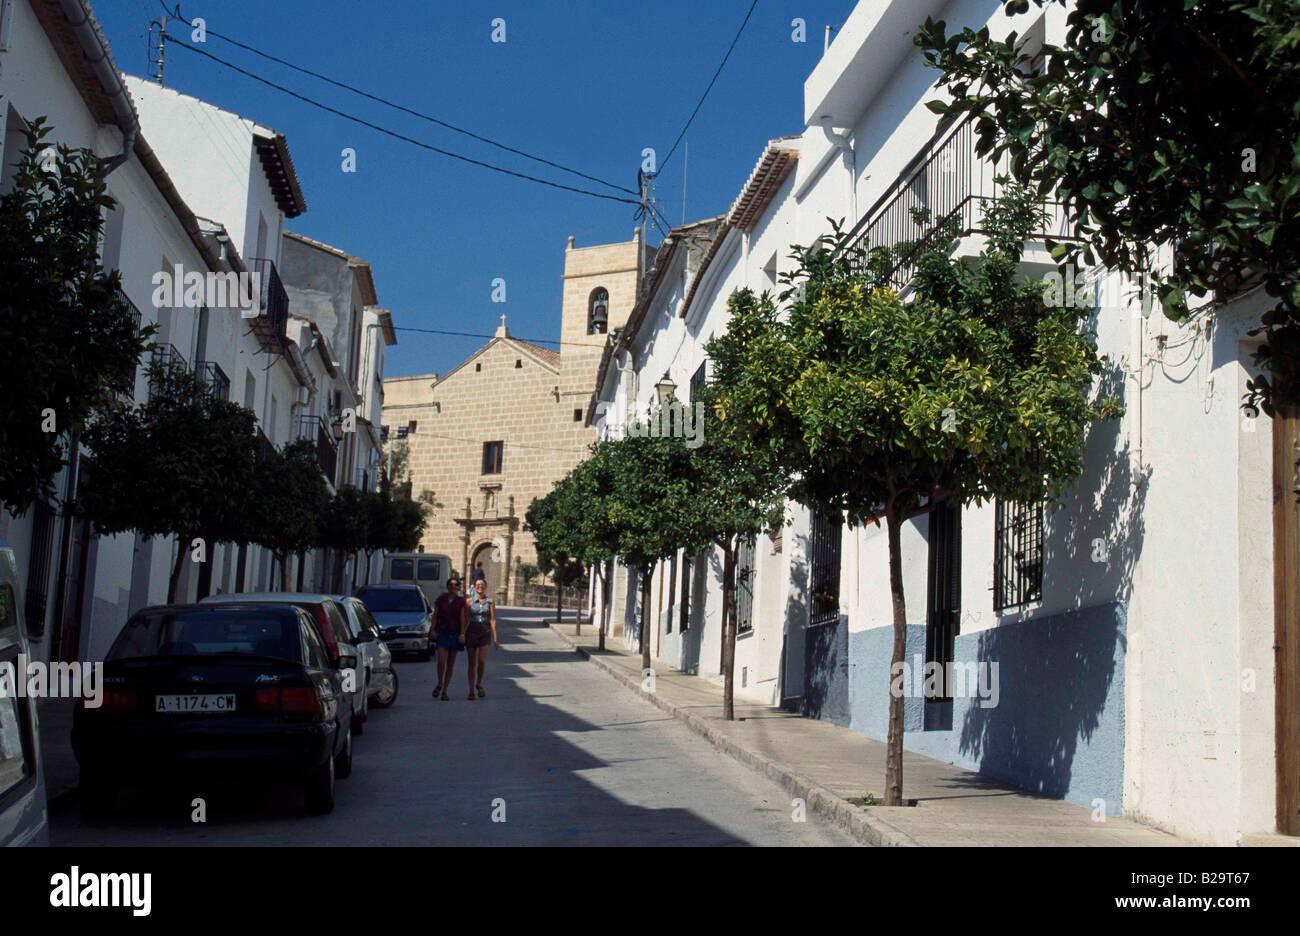 Benissa Costa Blanca Spain Ref WP LMB 103 COMPULSORY CREDIT World Pictures Photoshot - Stock Image